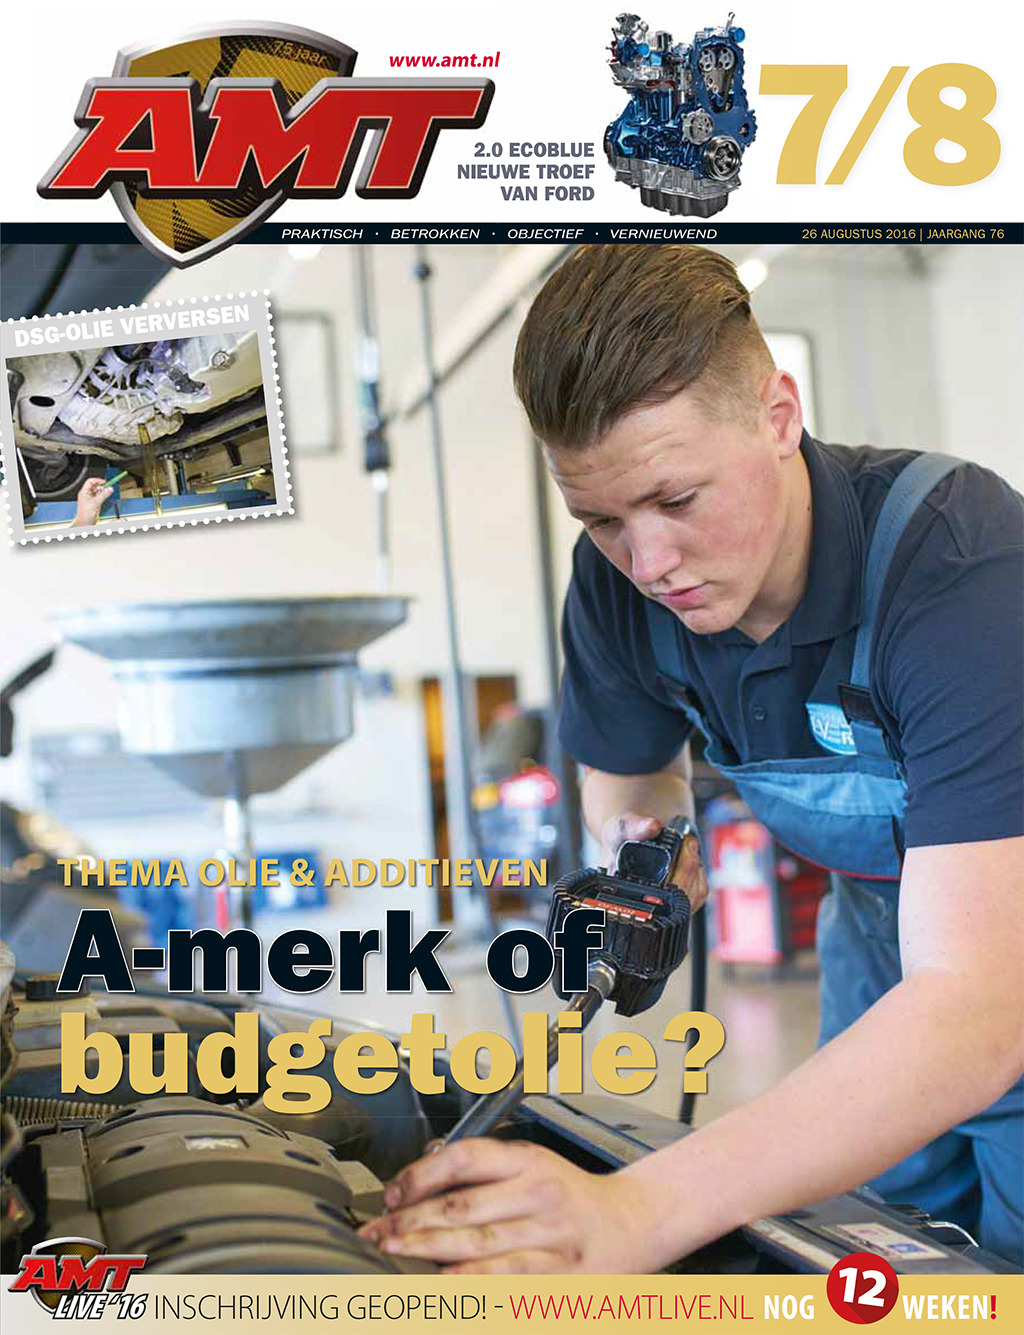 AMT editie 7 / 8 – 2016